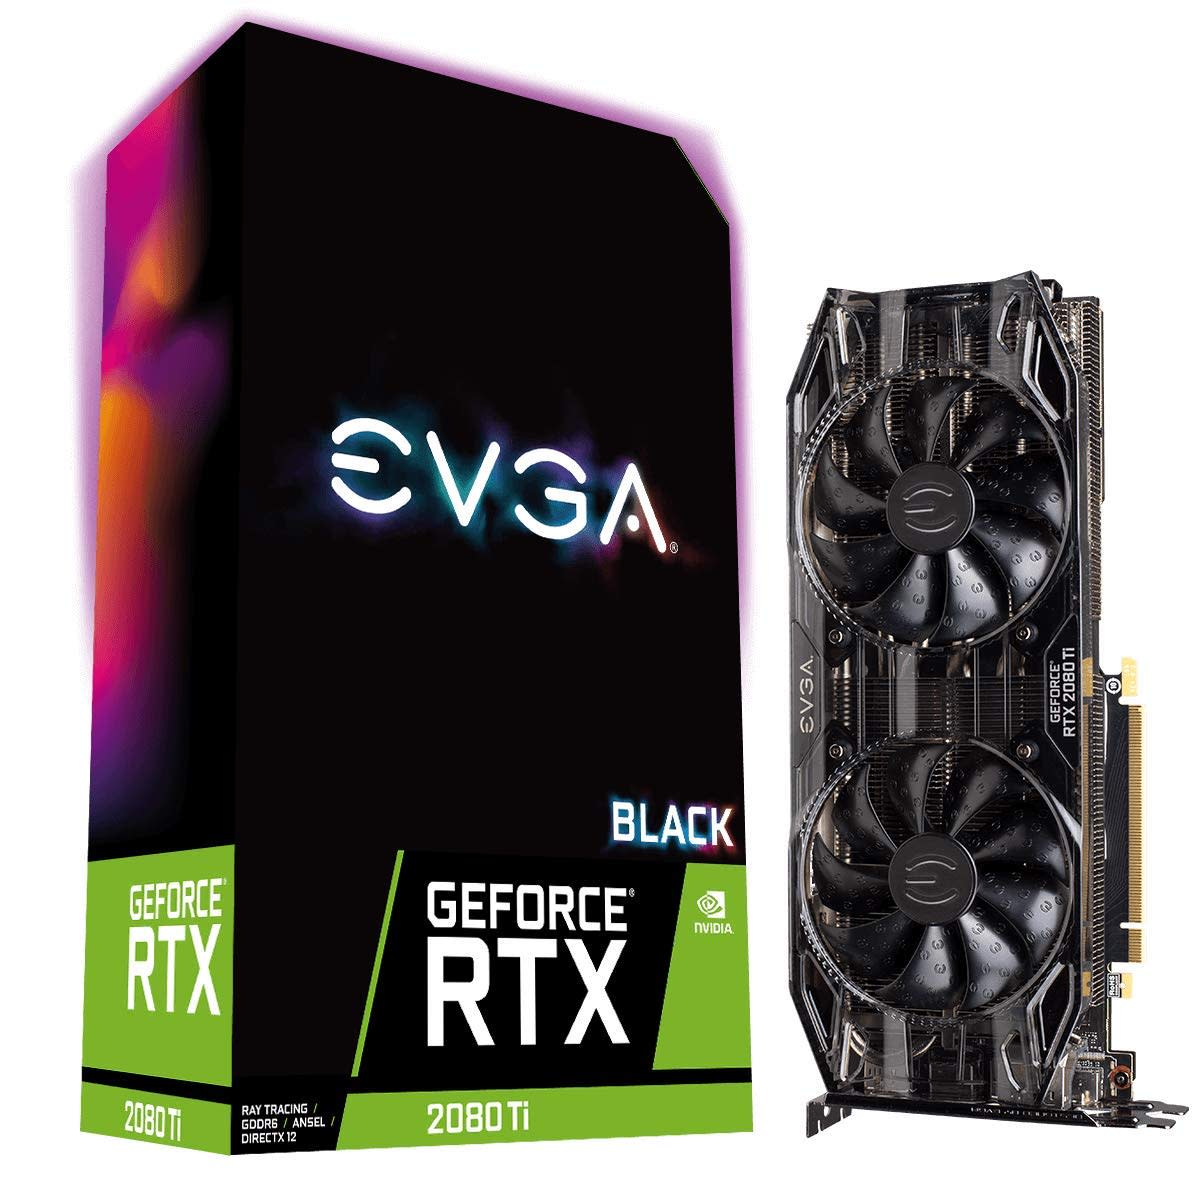 EVGA nVidia RTX 2080 Ti Black Edition Gaming Graphics Card